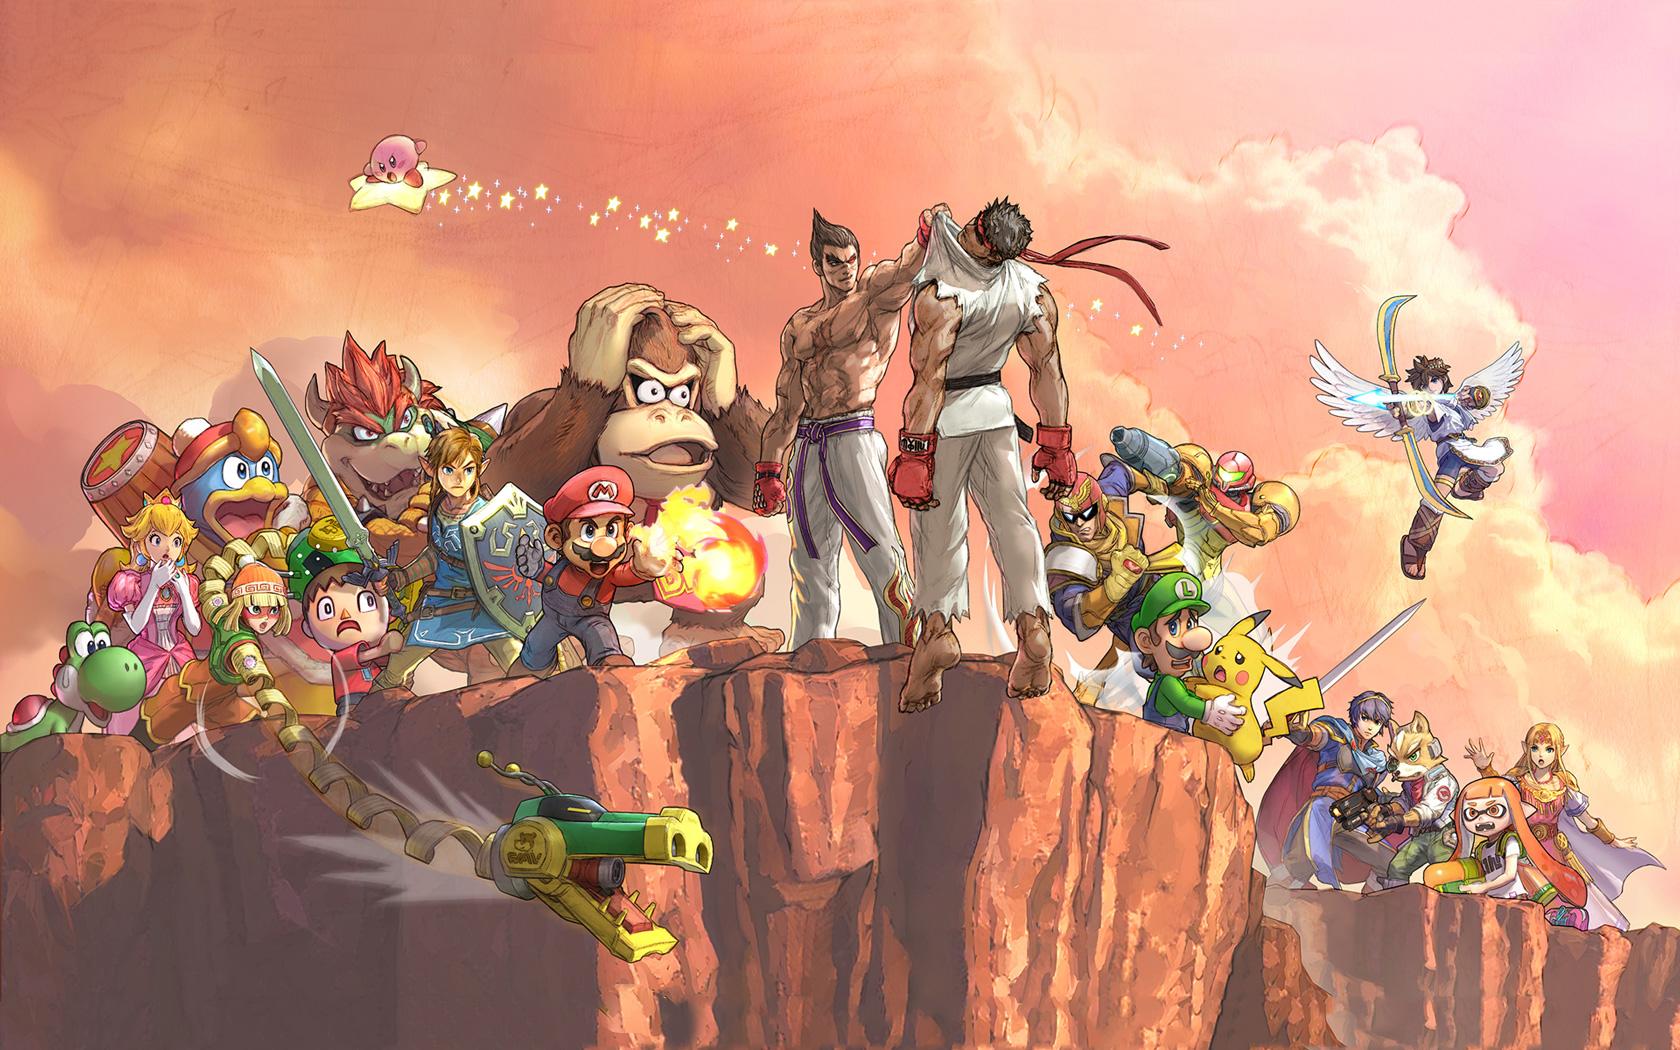 Free Super Smash Bros. Ultimate Wallpaper in 1680x1050